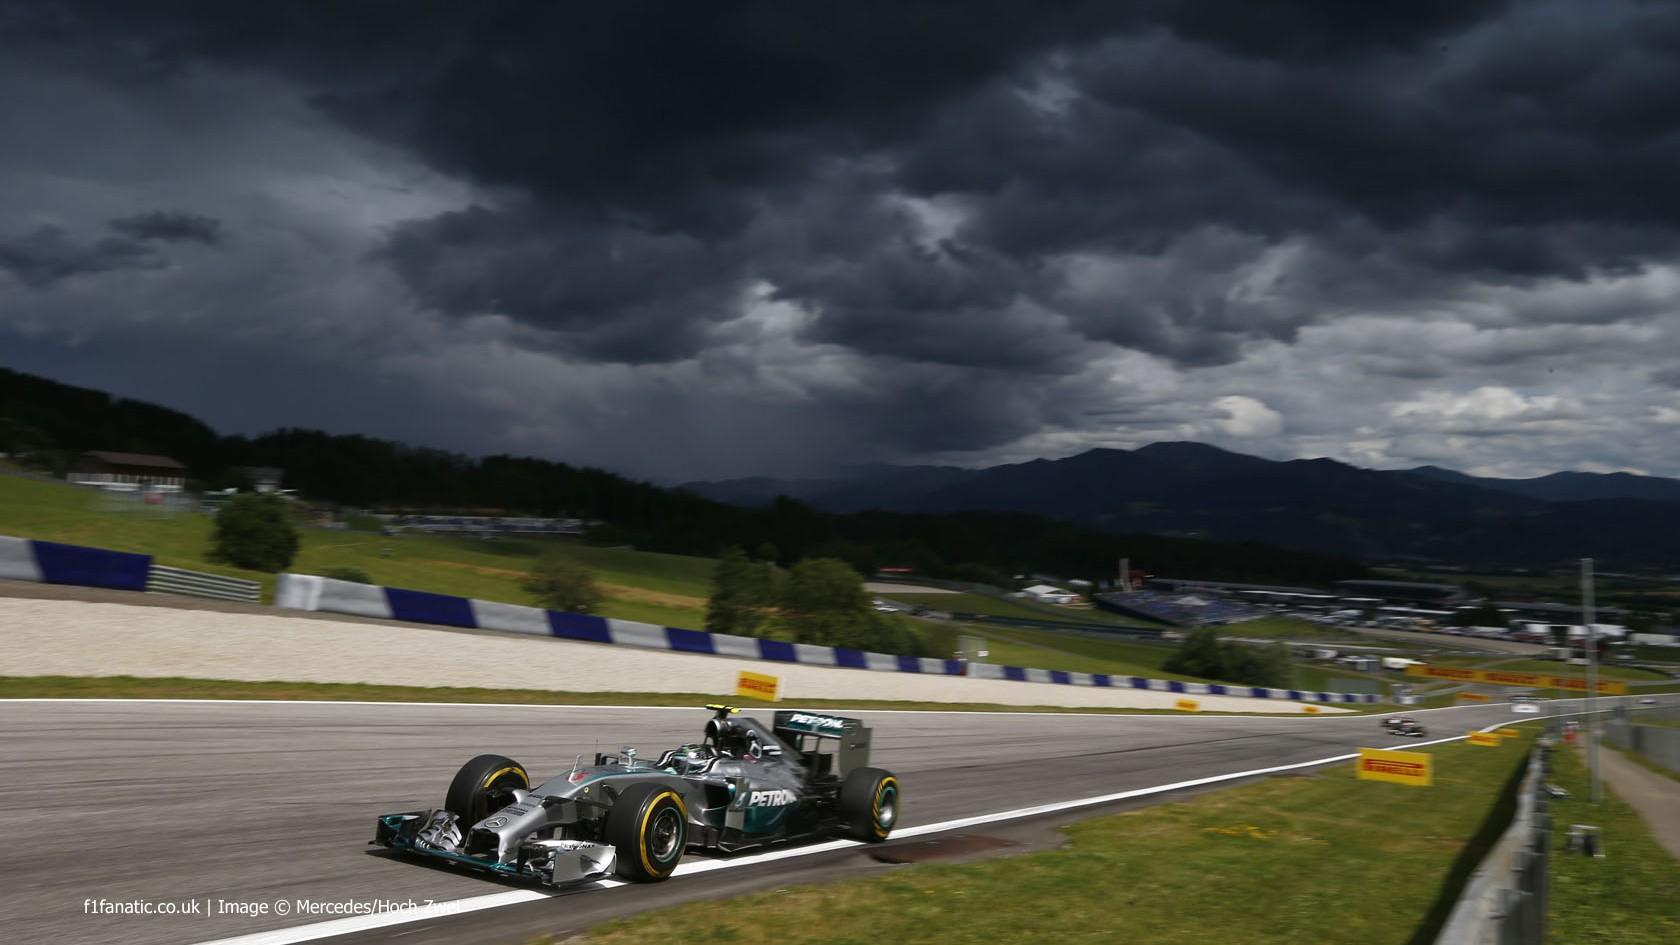 Nico Rosberg, Mercedes, Red Bull Ring, 2014